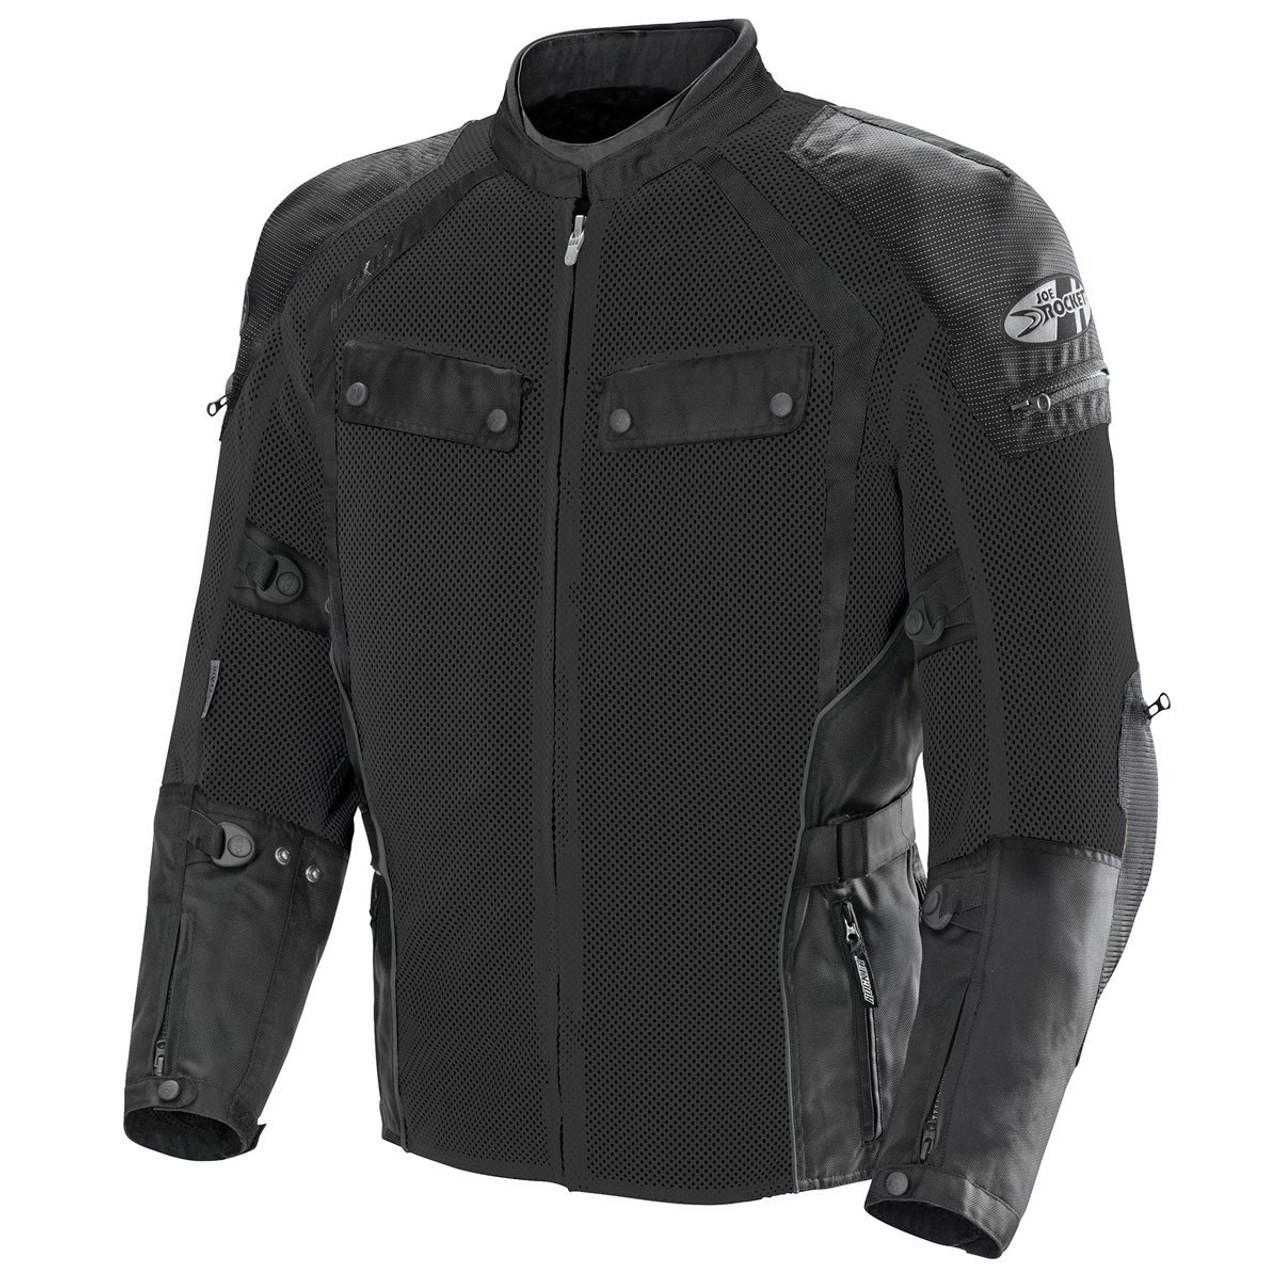 Tourmaster Mens Advanced Textile Motorcycle Jacket Black//Black MDT Medium Tall